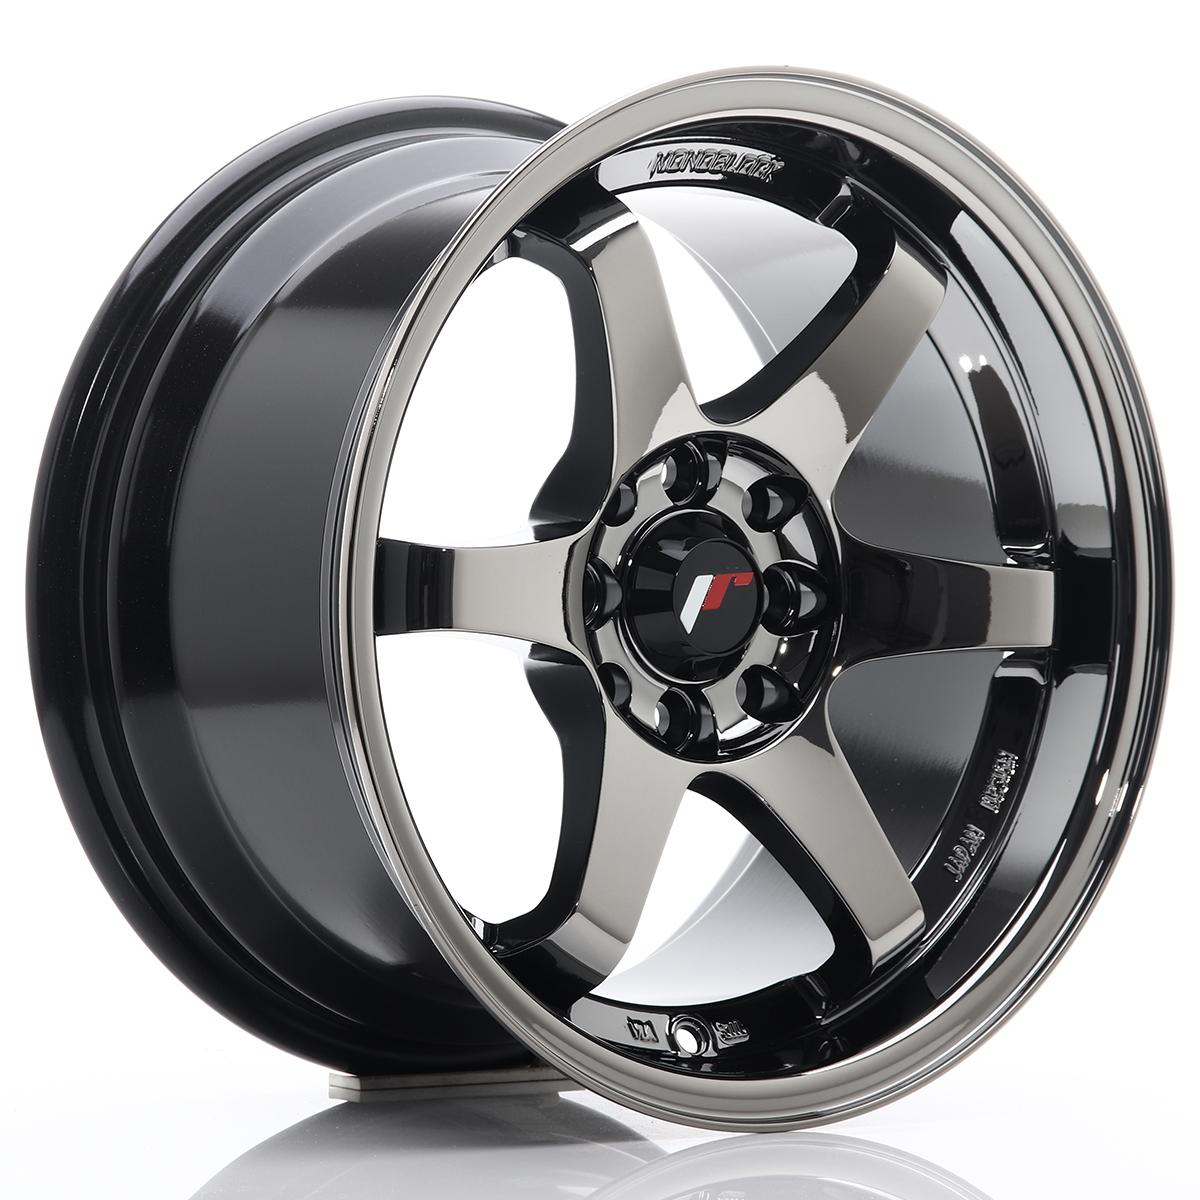 JR Wheels JR3 15x8 ET25 4x100/108 Black Chrome